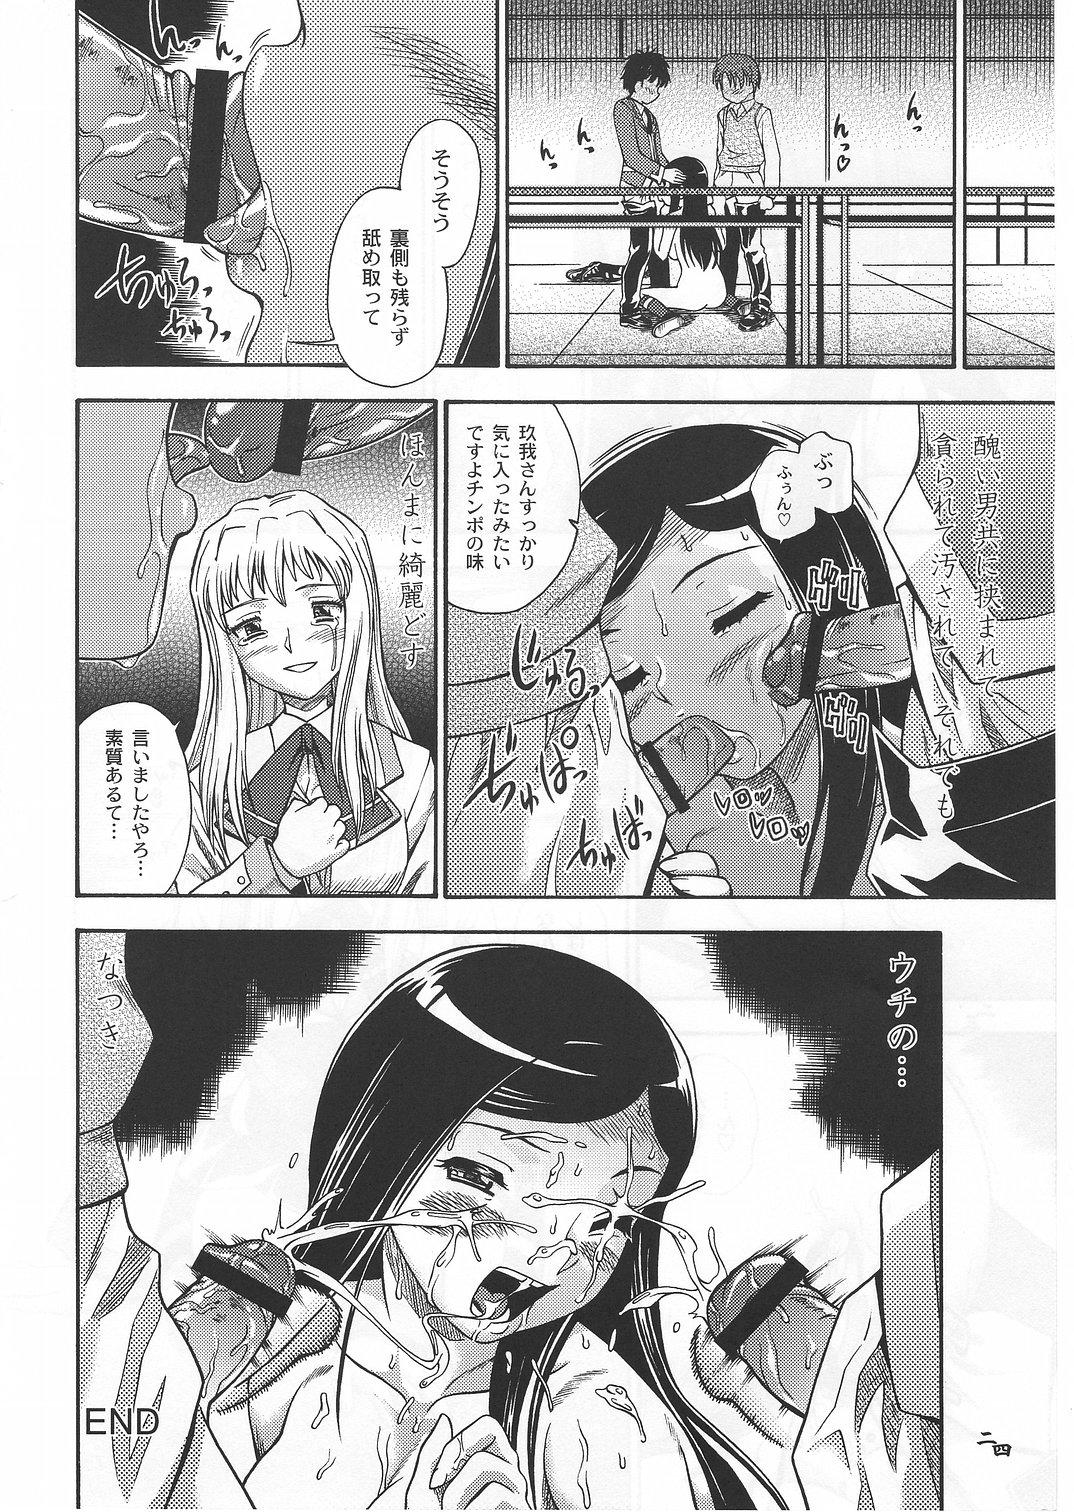 Amai Himegoto Nikaime 22